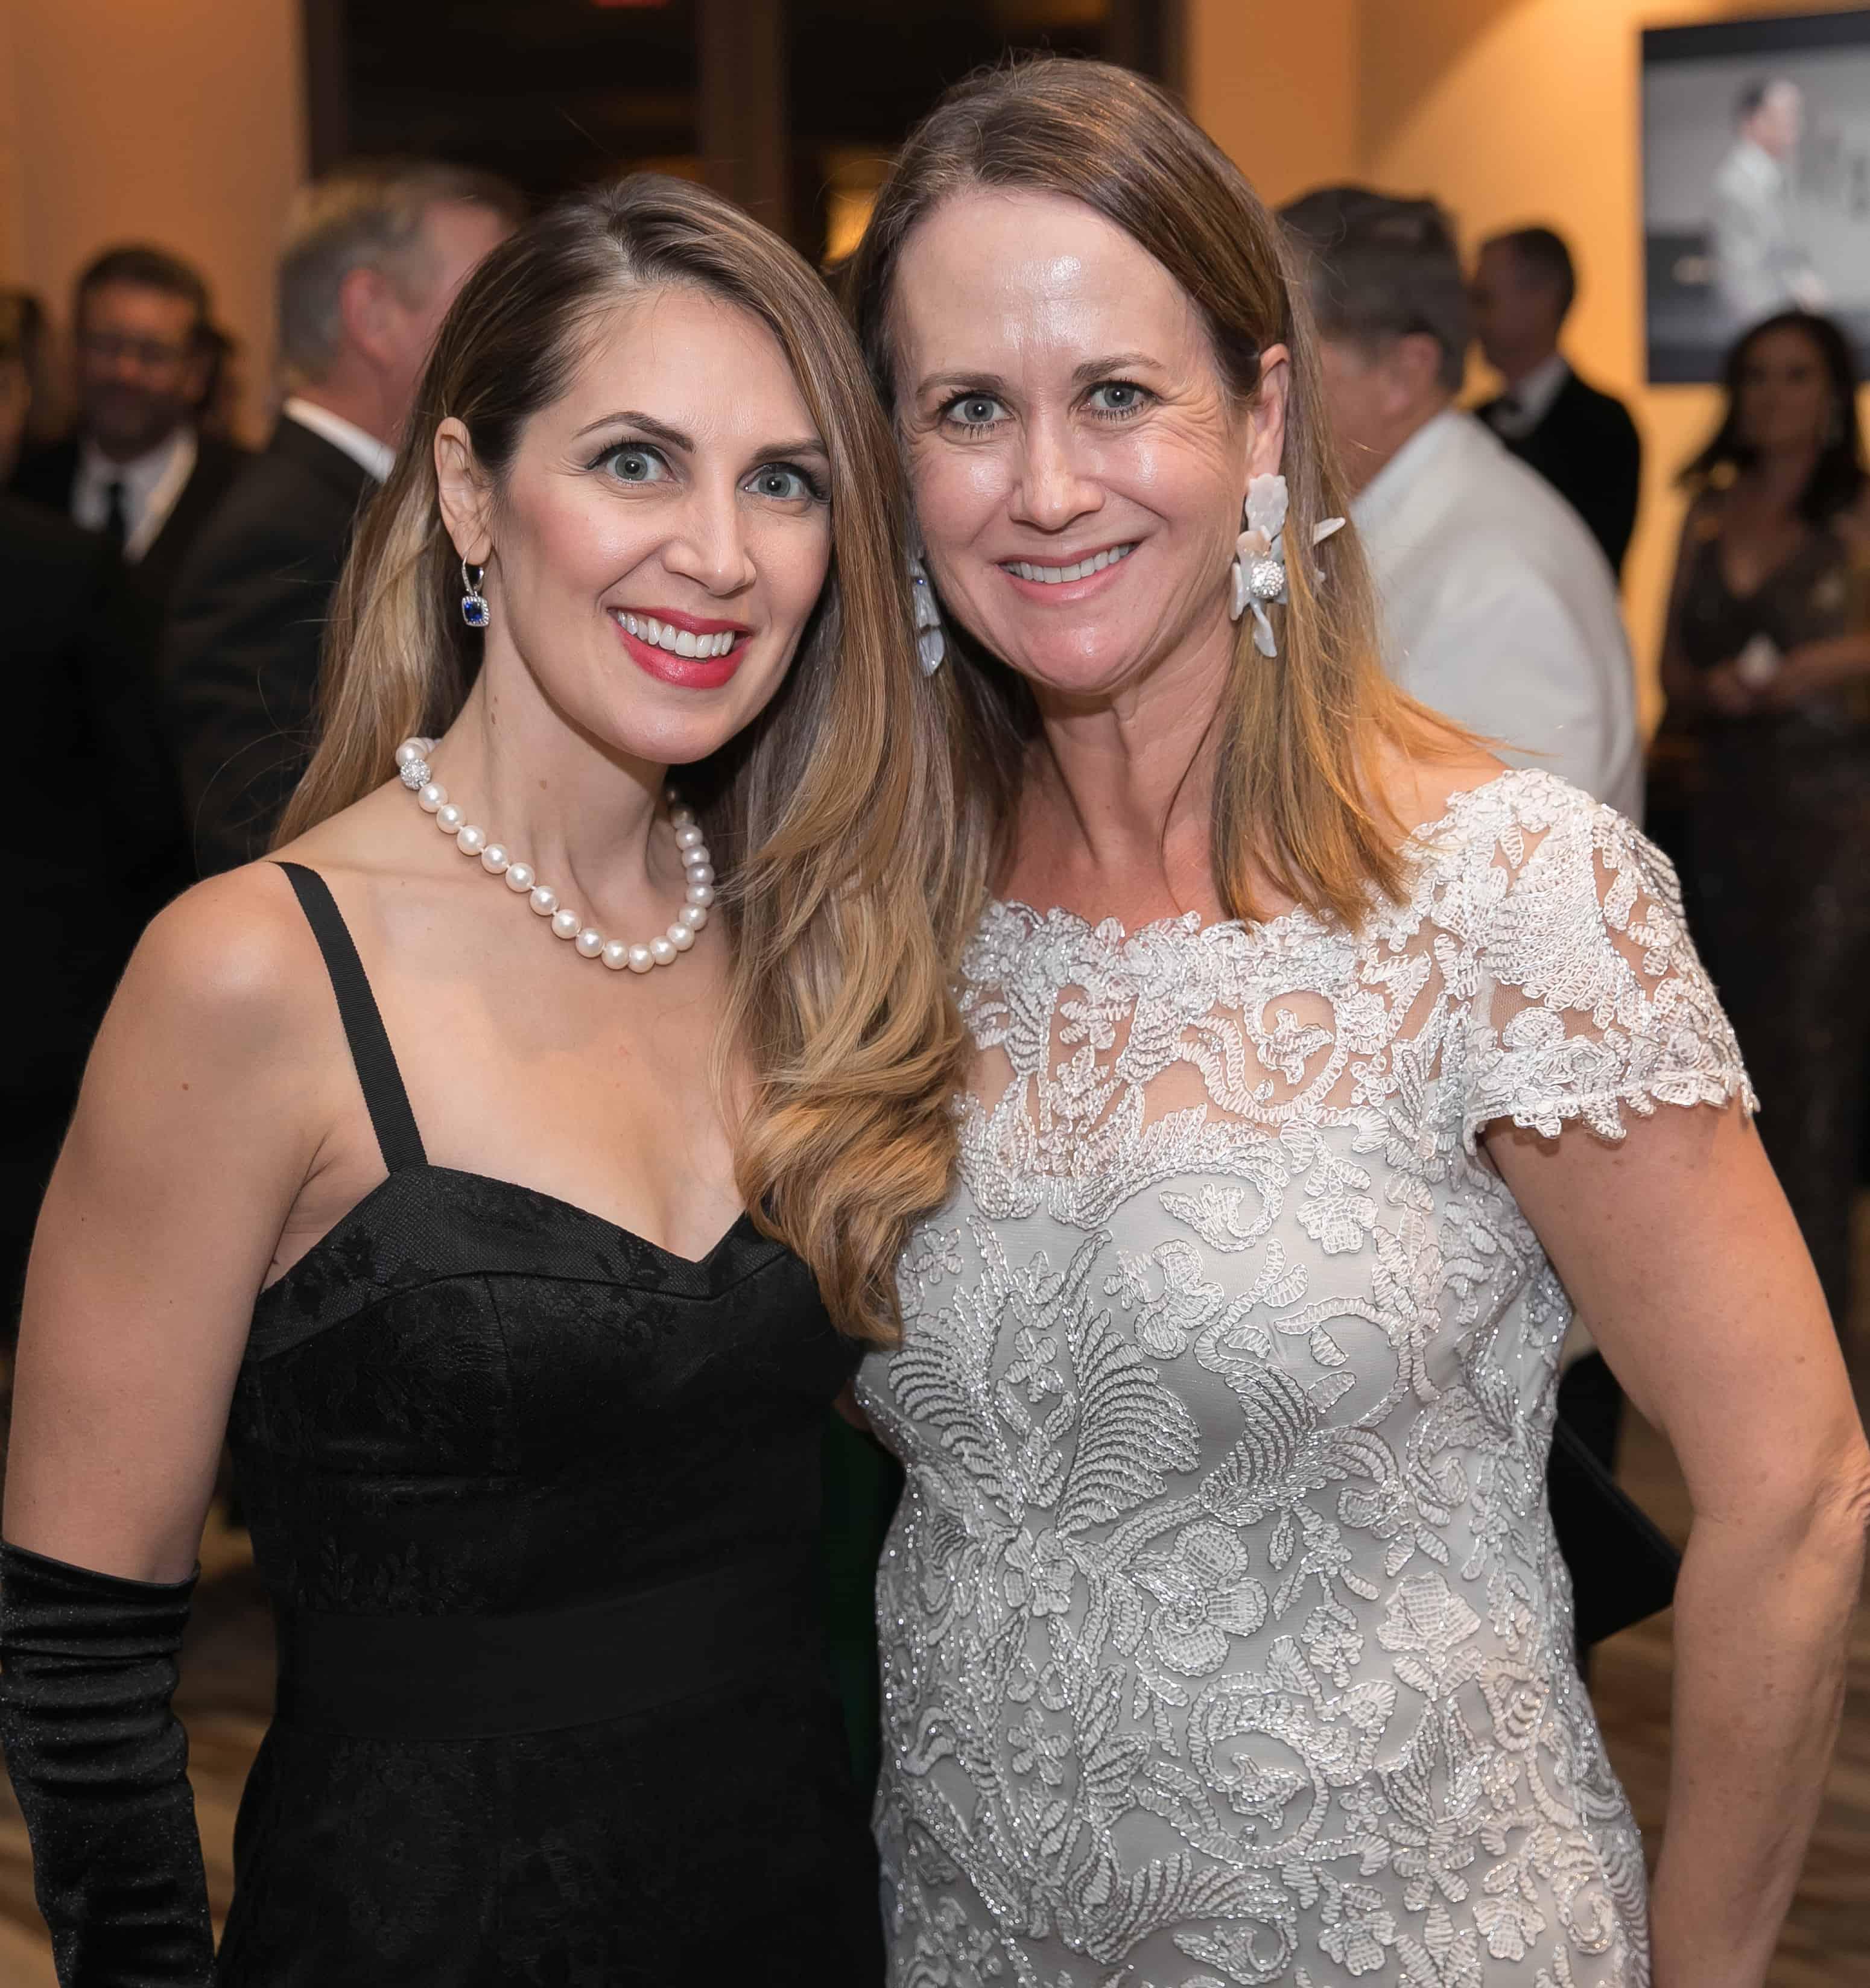 Laura Craddick and Leslie Davenport